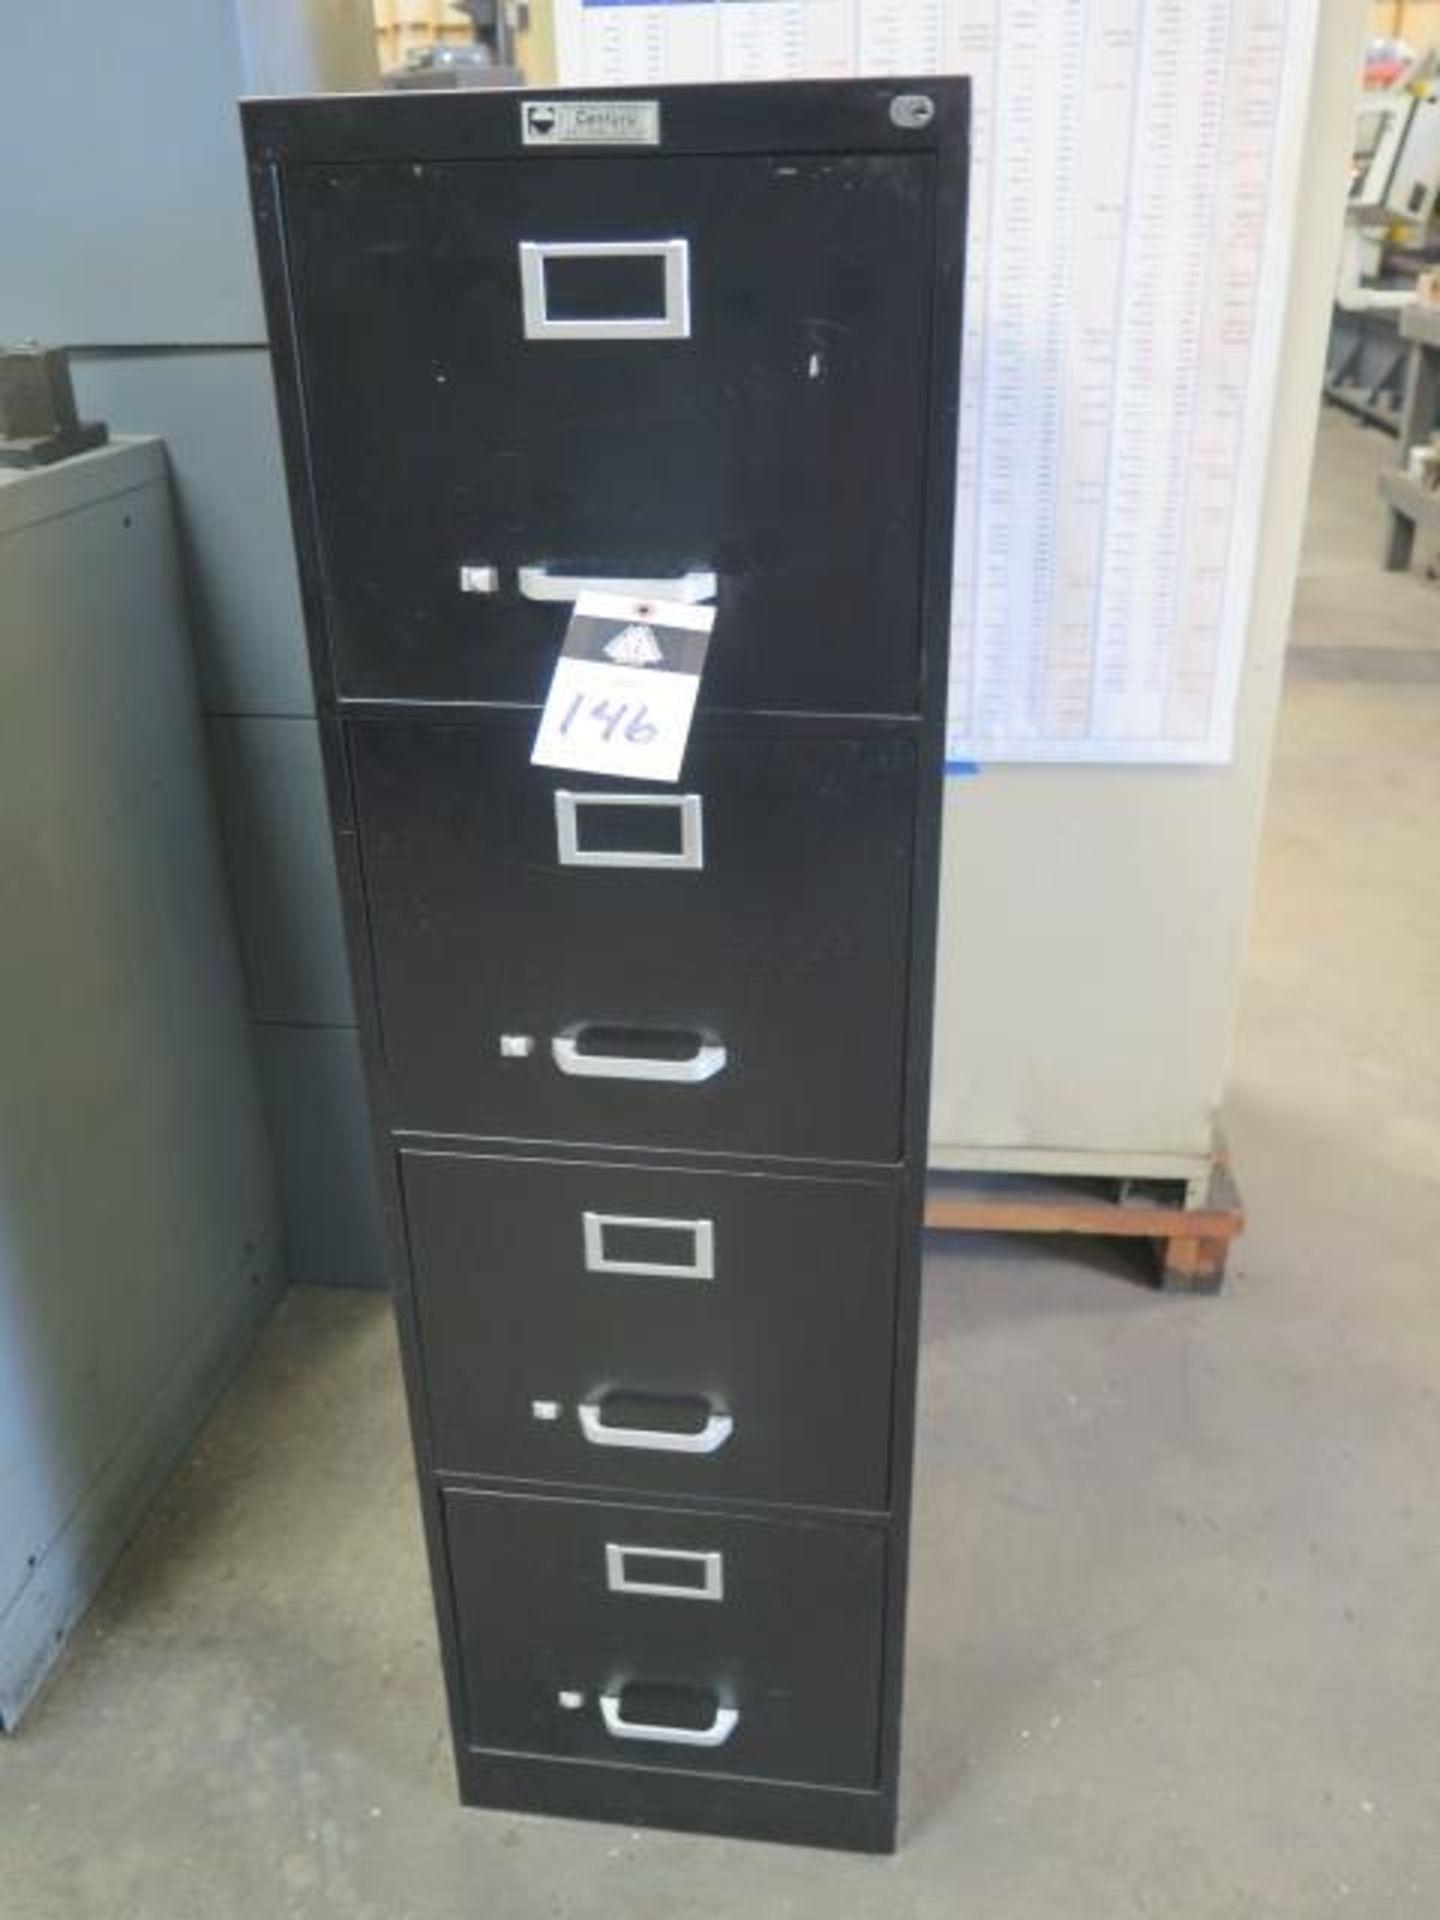 File Cabinet w/ Reamers (SOLD AS-IS - NO WARRANTY)